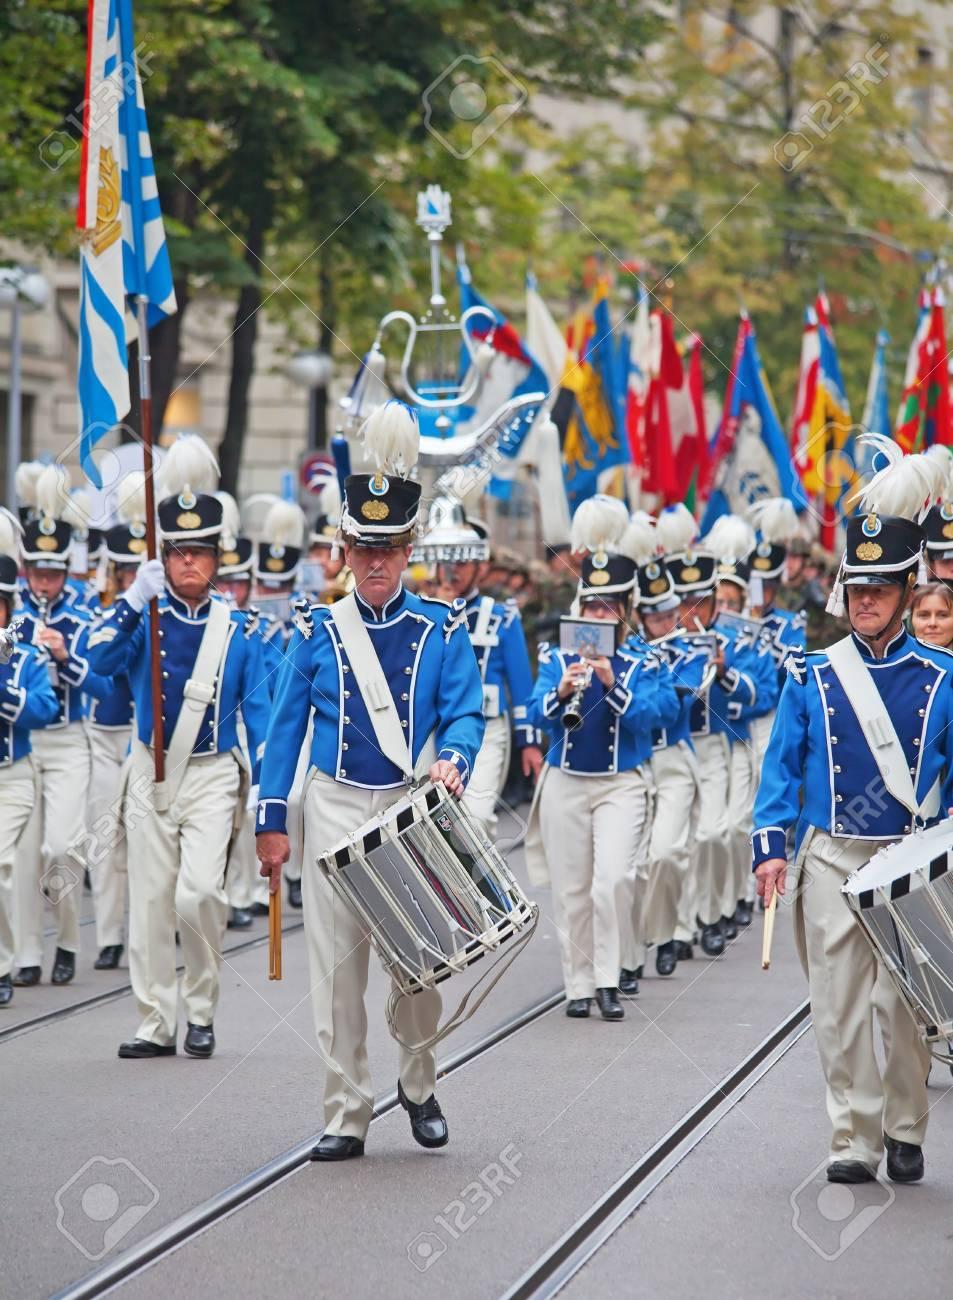 ZURICH - AUGUST 1: Swiss National Day parade on August 1, 2011 in Zurich, Switzerland. Zurich city orchestra opening the parade. Stock Photo - 14148813